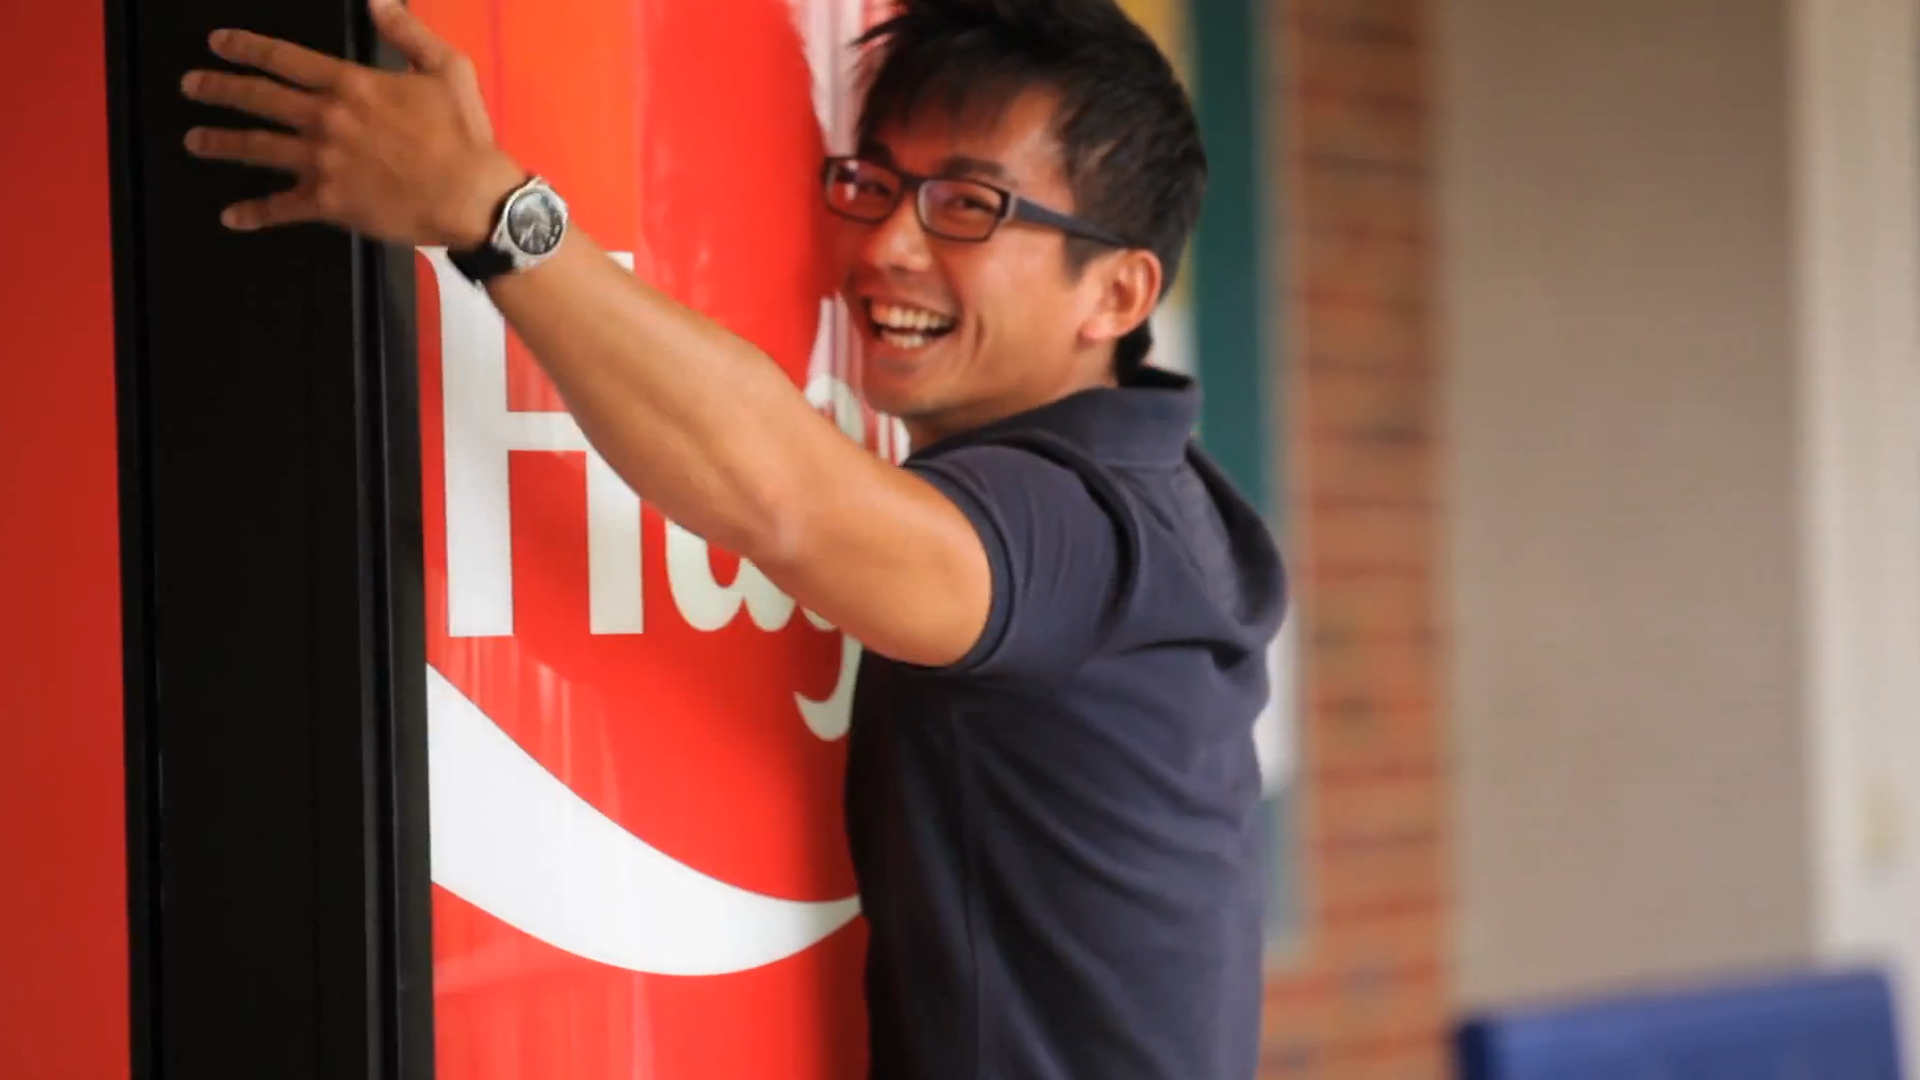 Coke machine hug.png